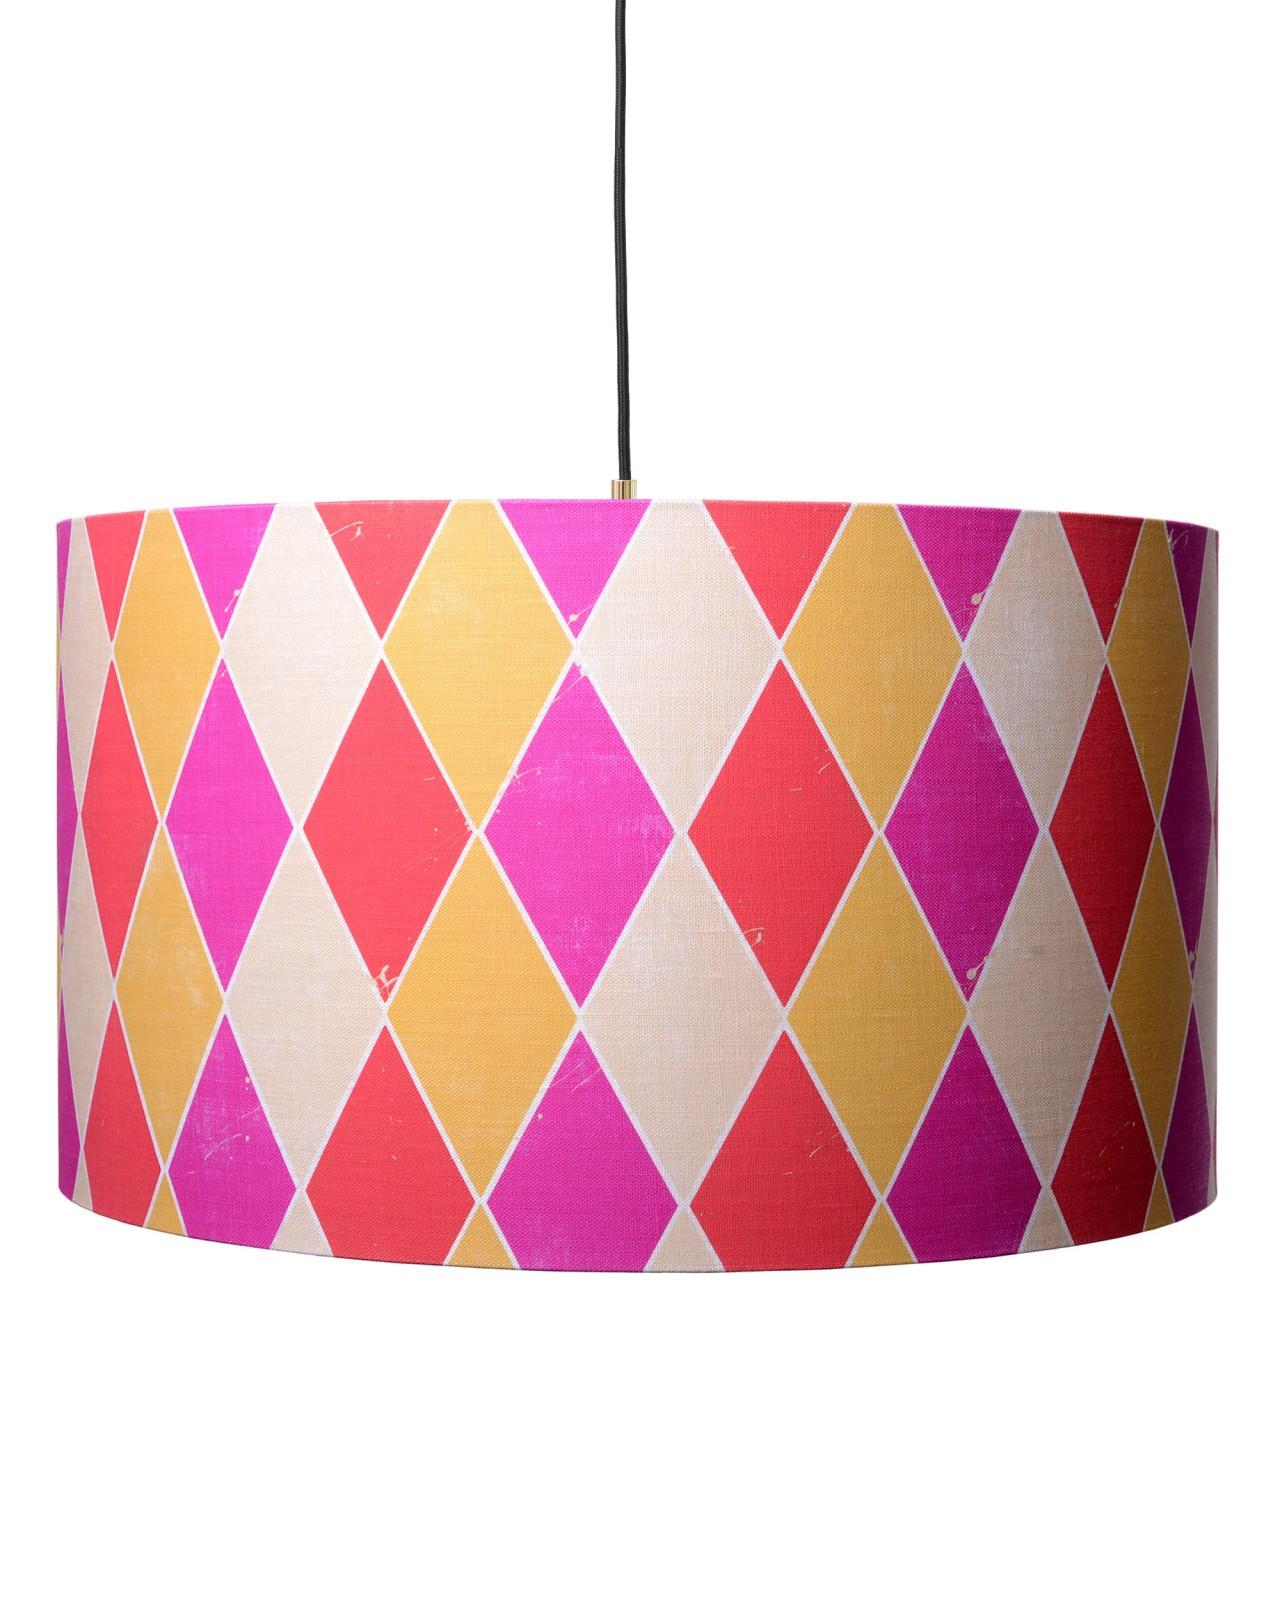 MADNESS Pendant Lamp